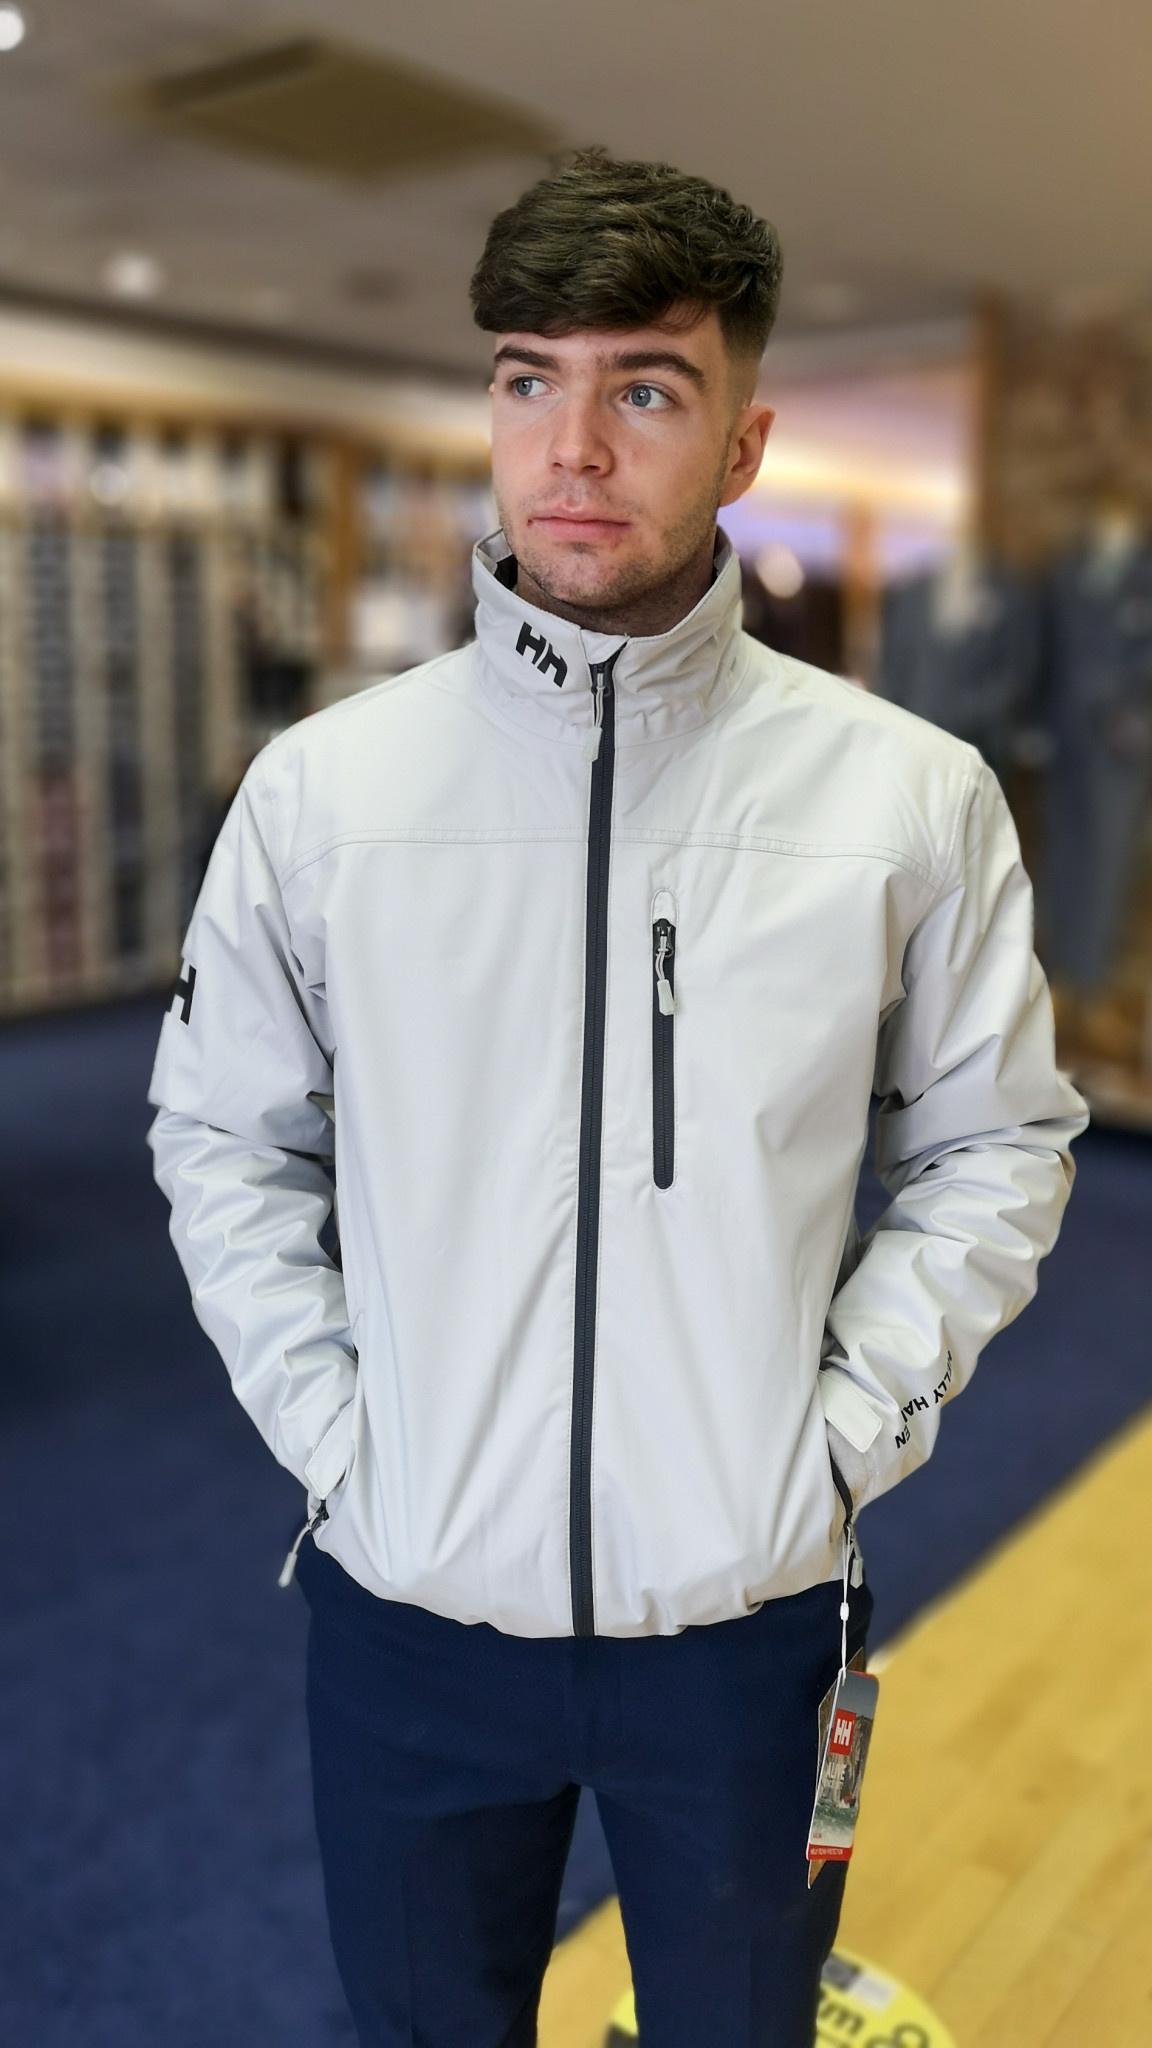 Helly hansen crew mid layer jacket